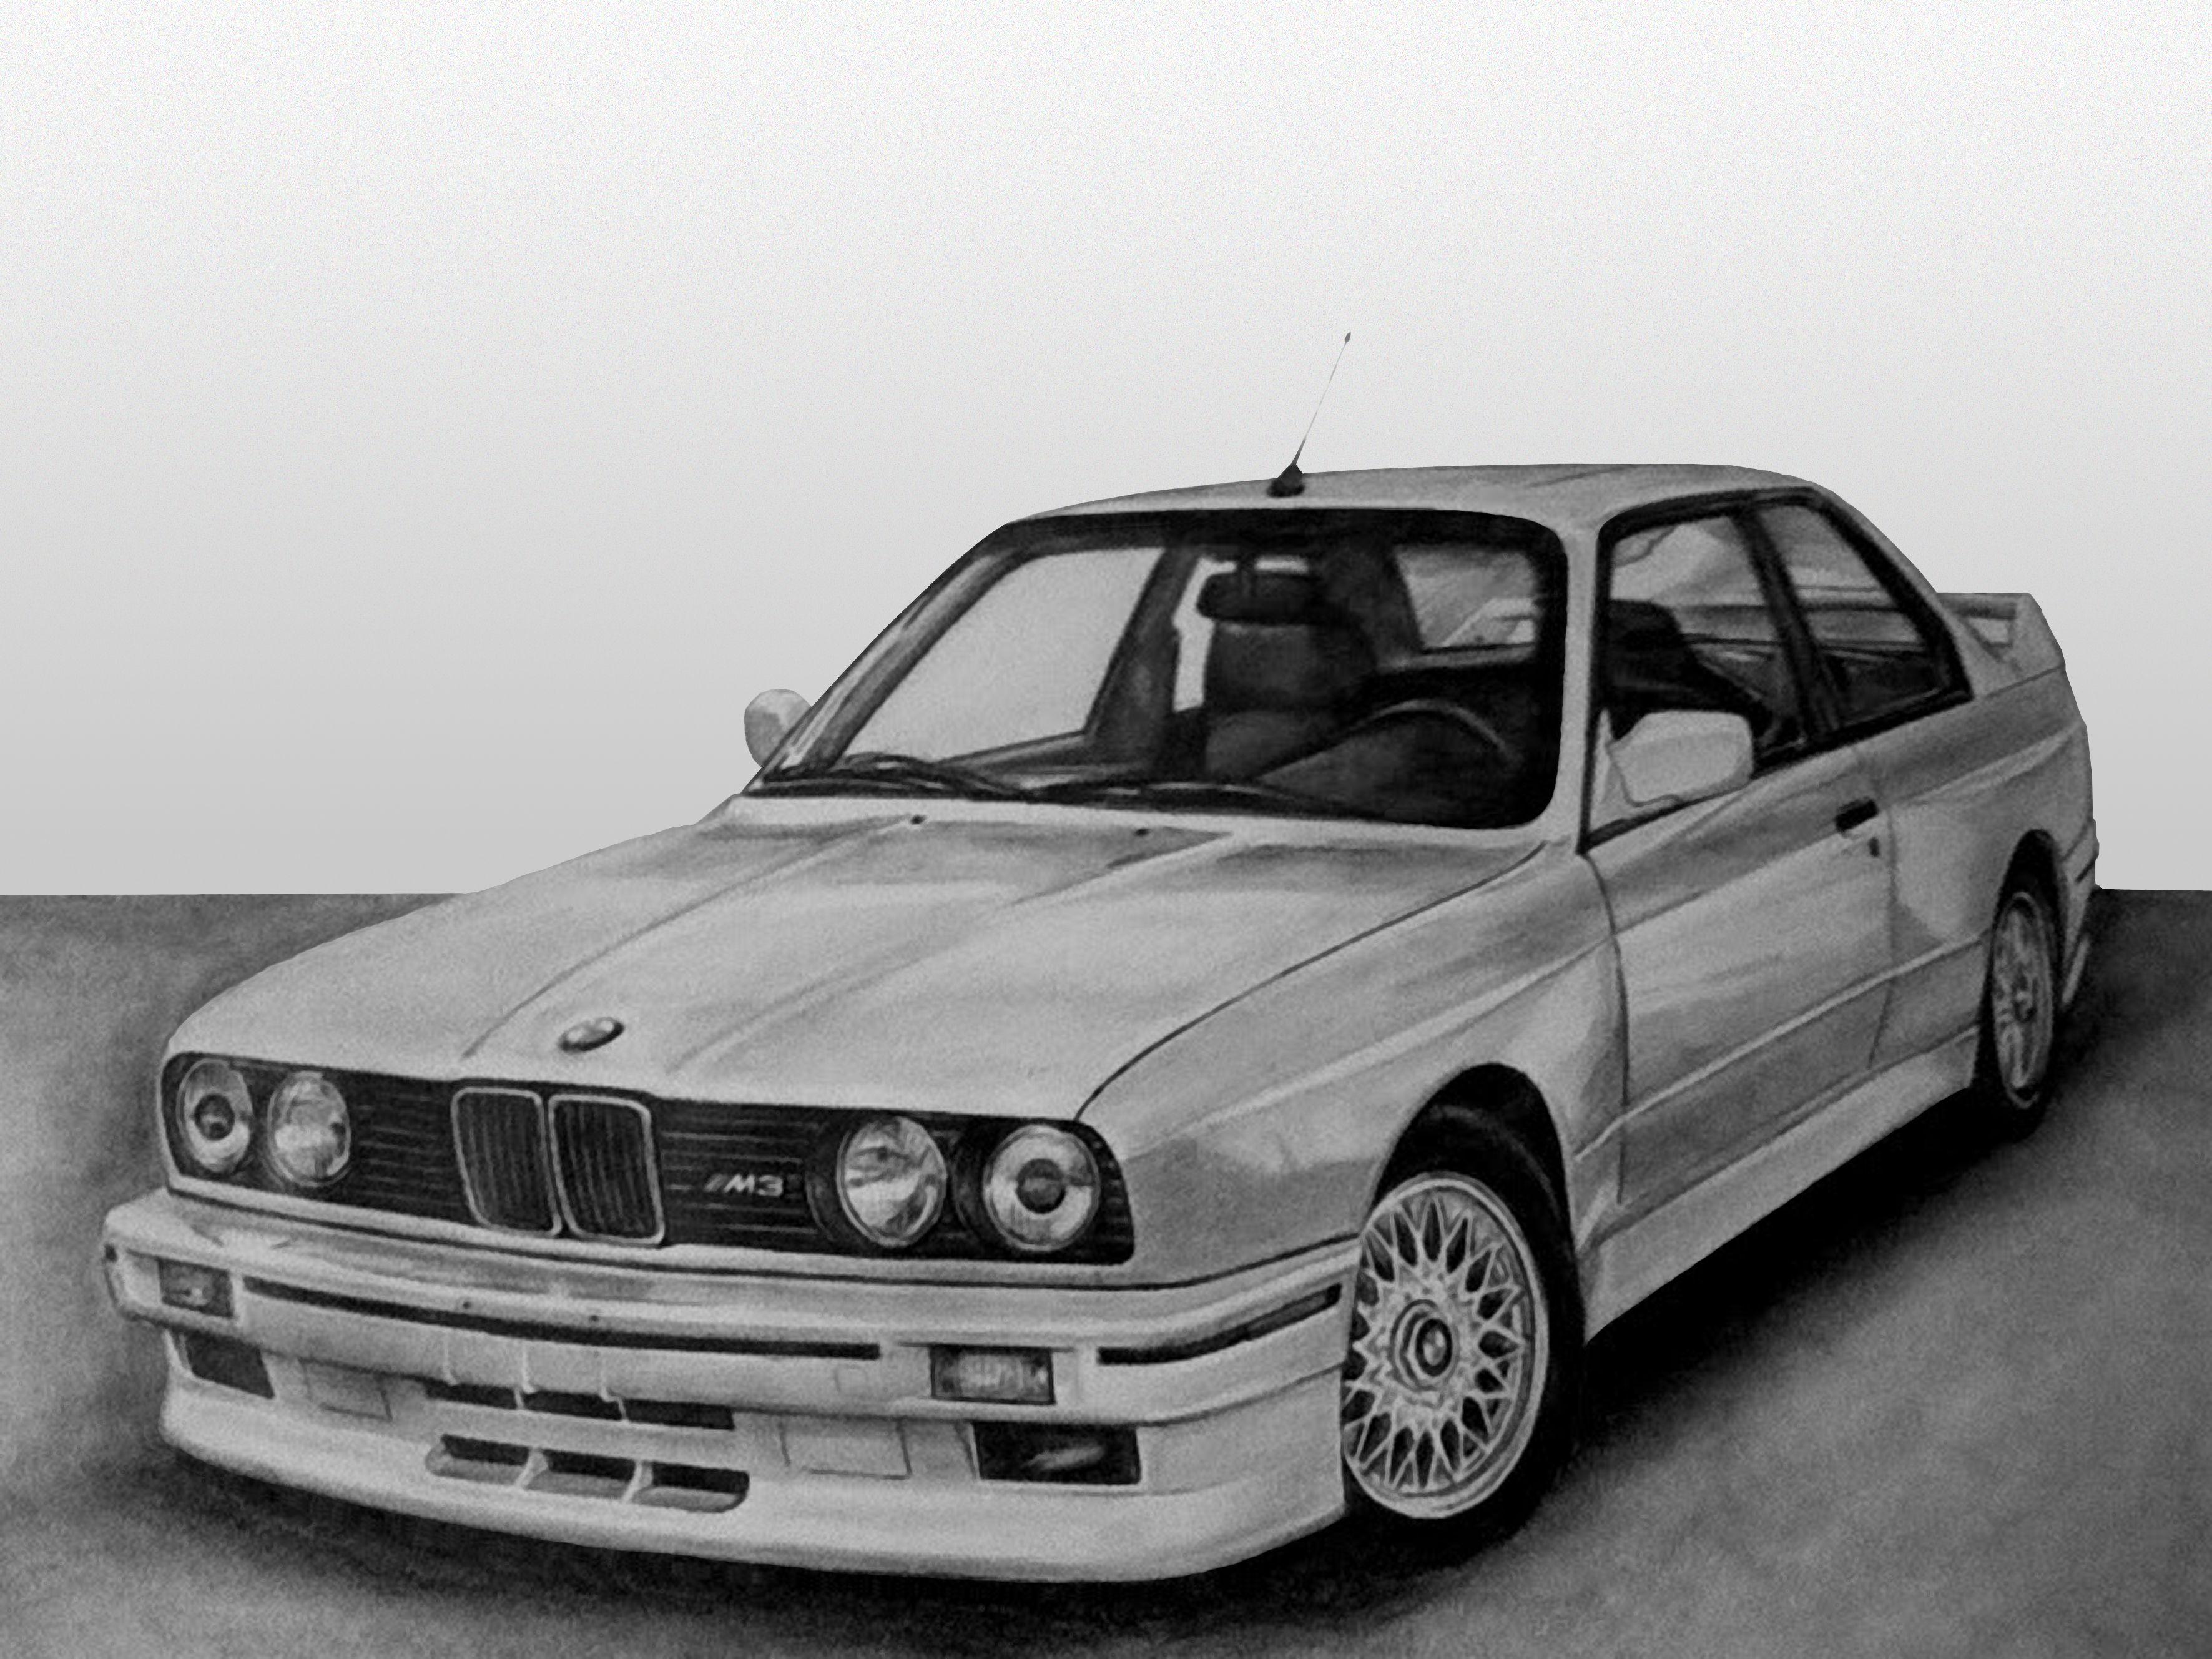 E30 M3 Drawing Bmw Cars Bmw E30 Bmw Cars